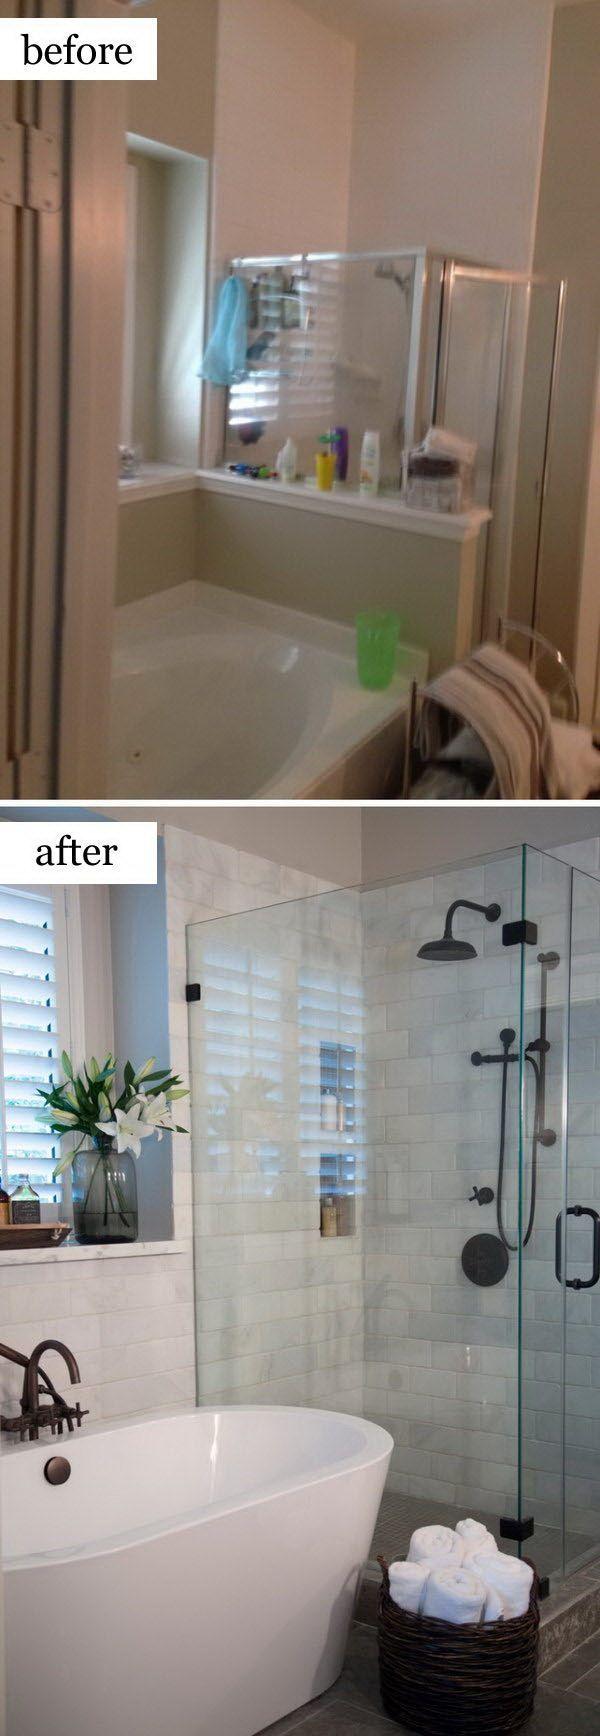 78 Best Bathrooms Images On Pinterest Carlisle Homes House Design And Home Design